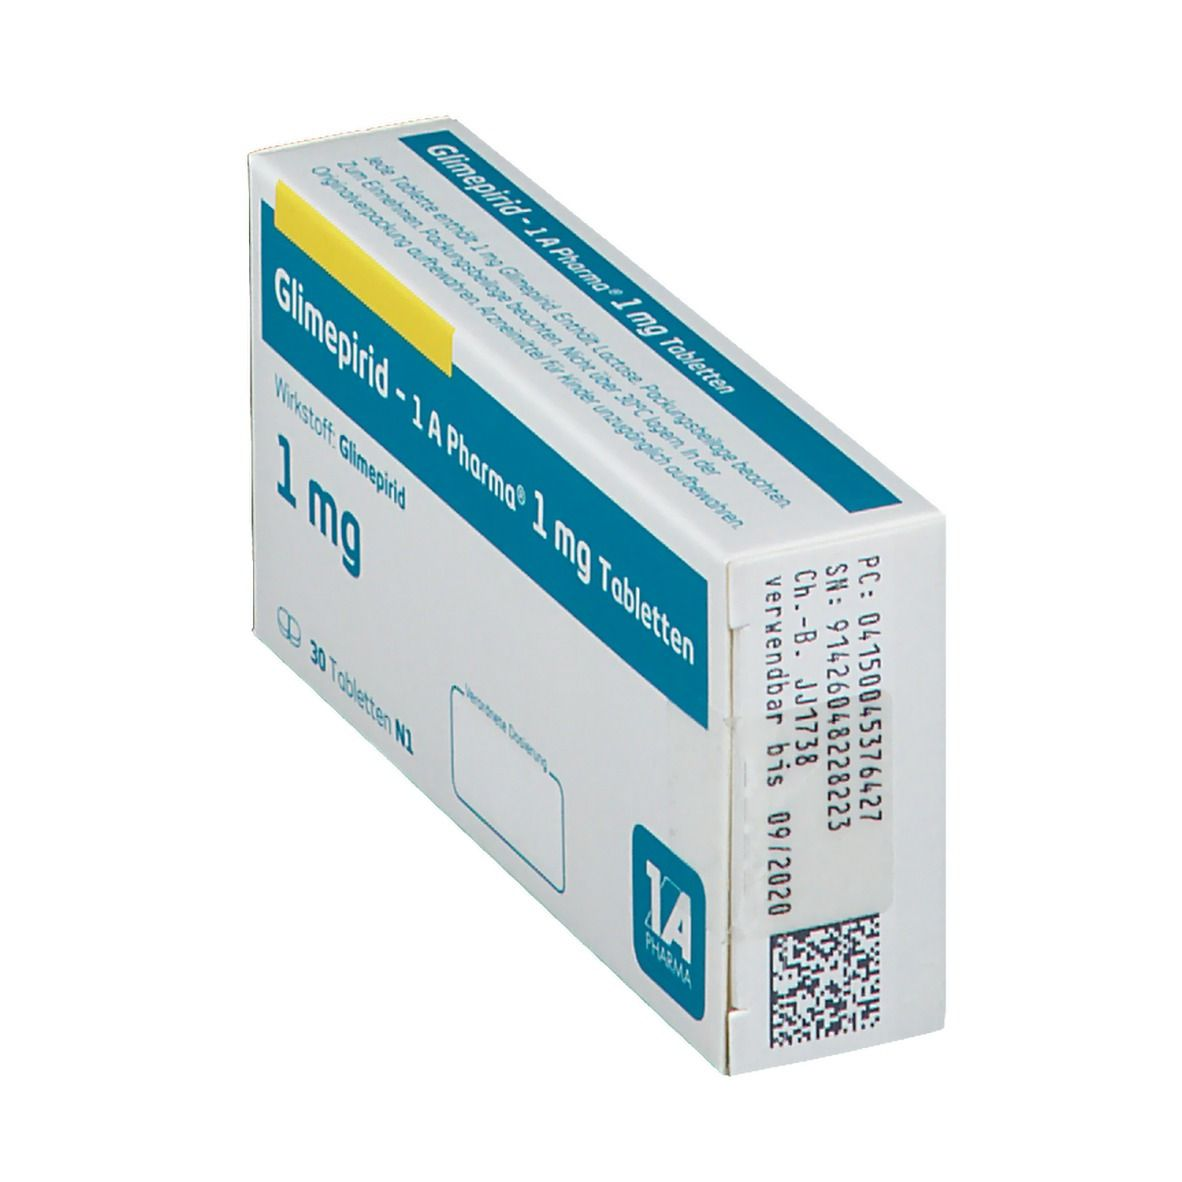 GLIMEPIRID 1A Pharma 1 mg Tabletten